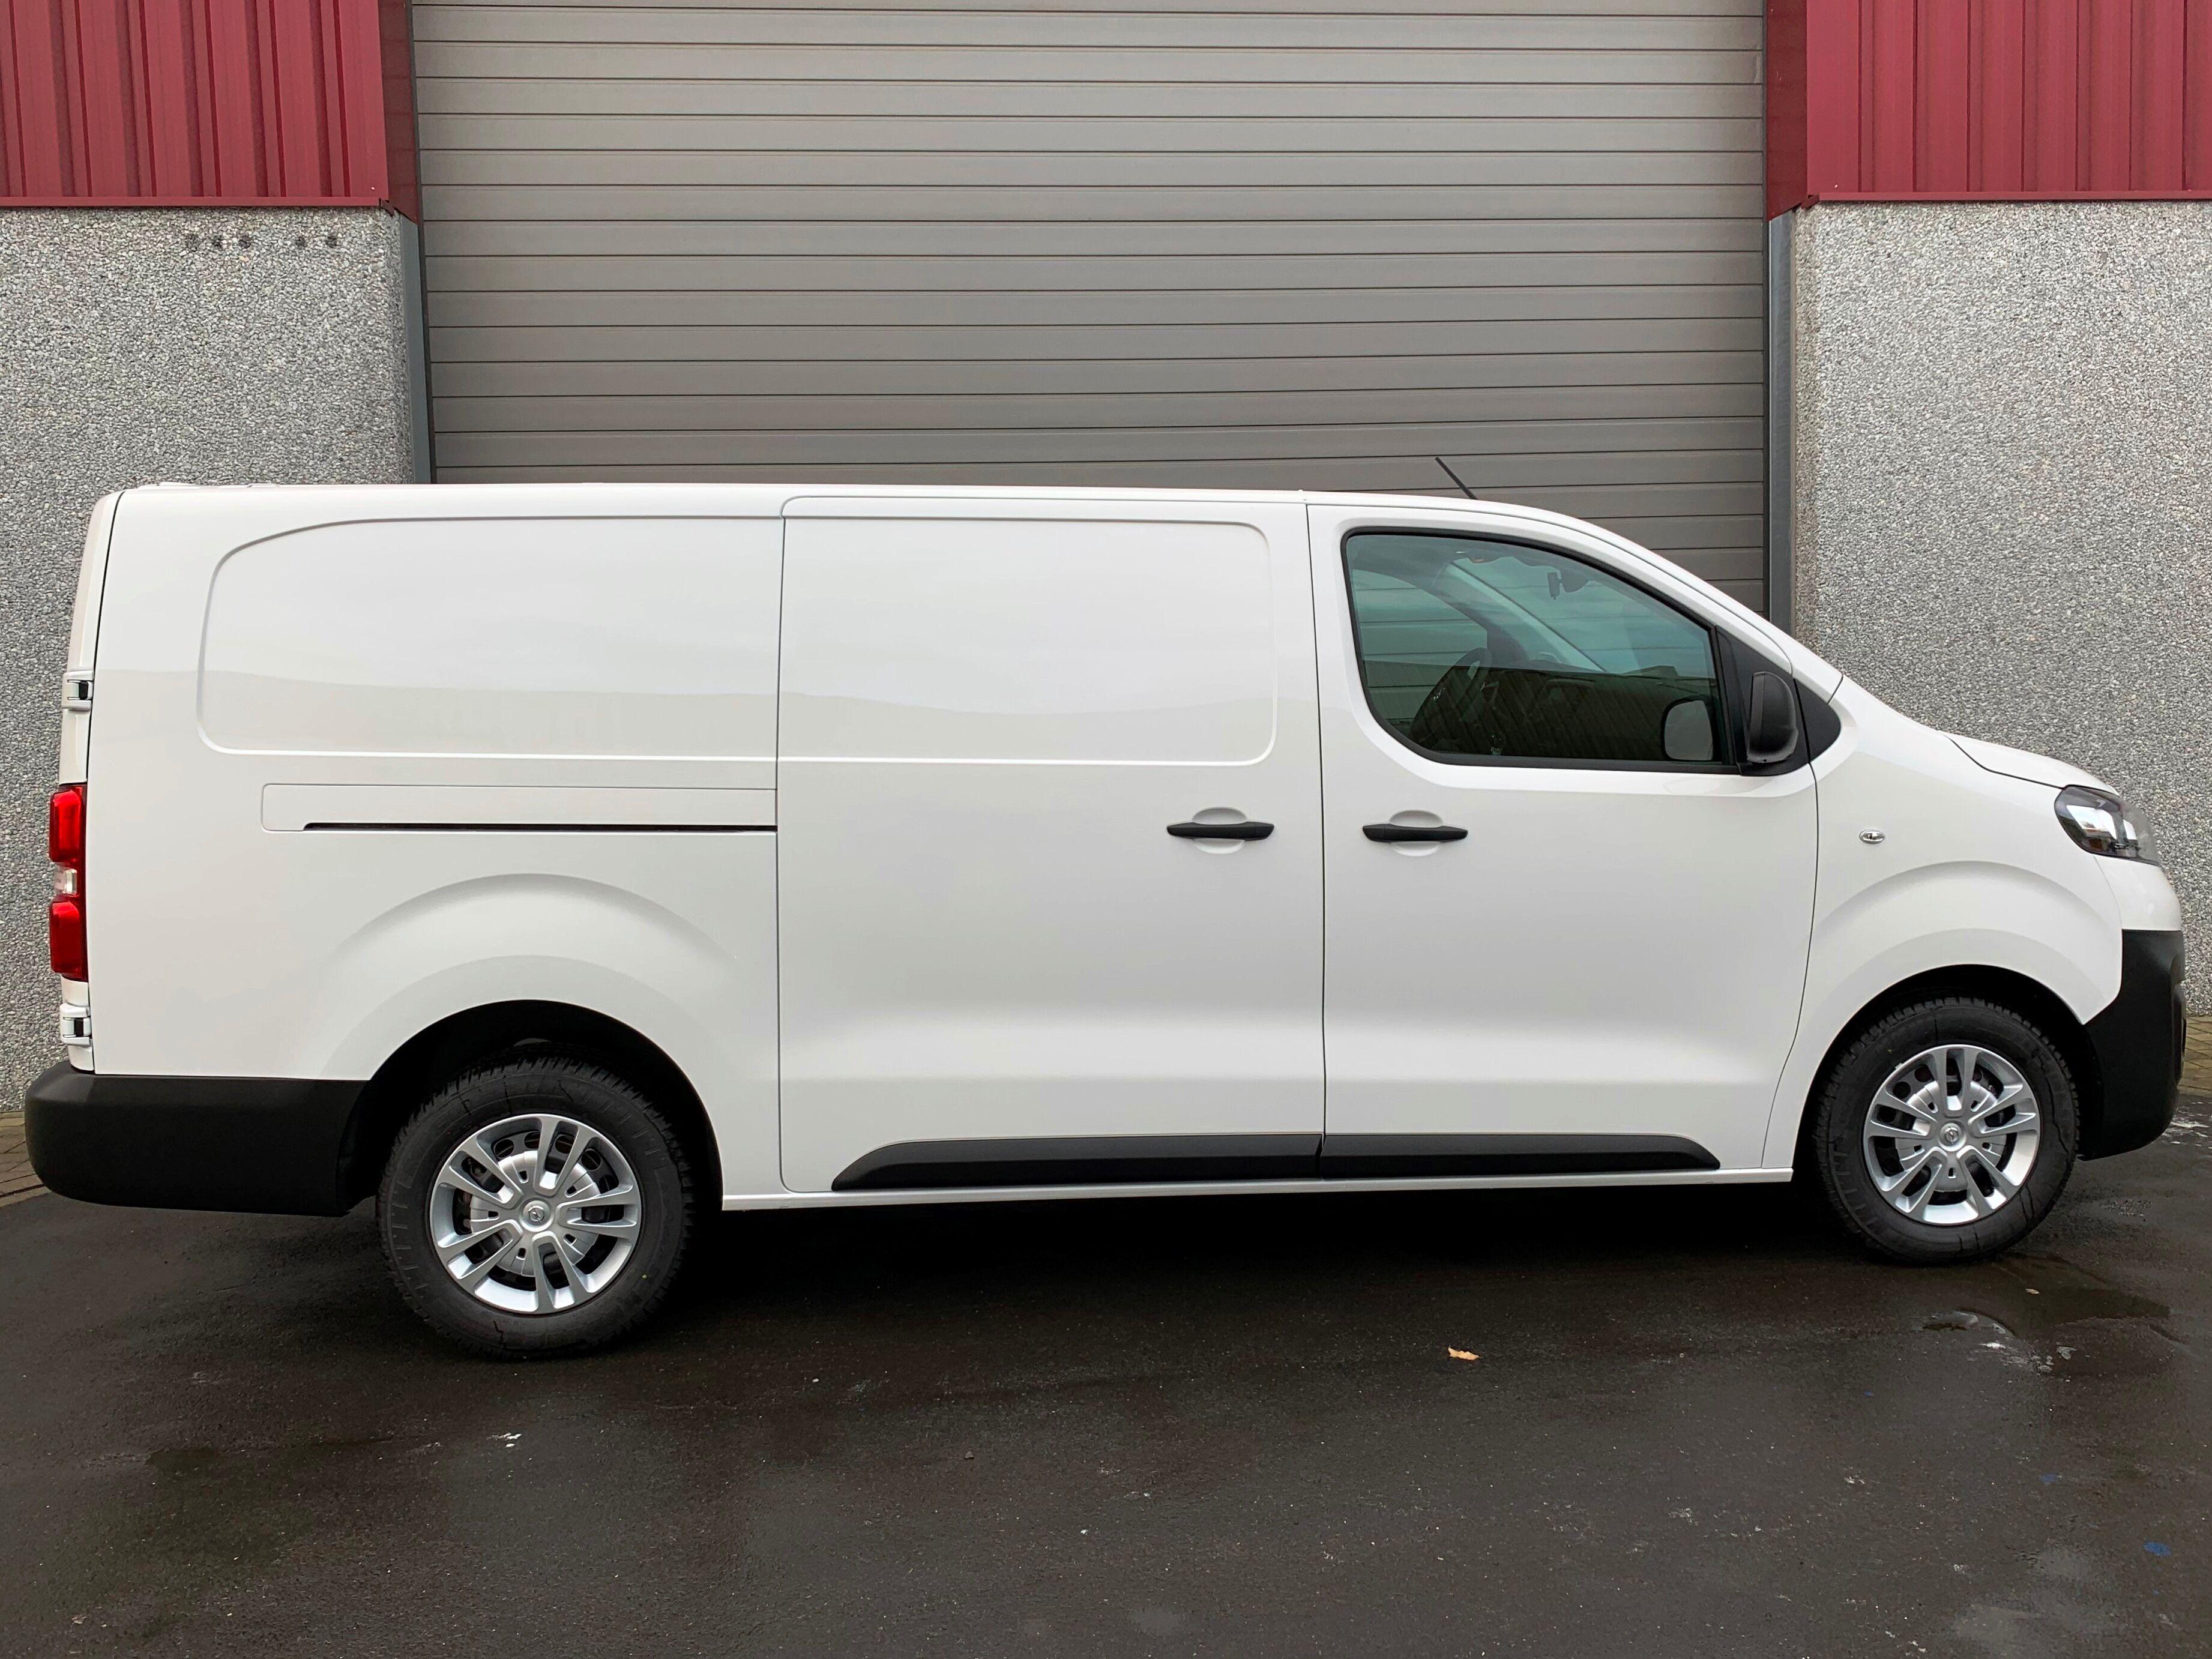 Opel Vivaro 2.0D 122PK Edition L3H1 NIEUW in stock 35% korting 9/29